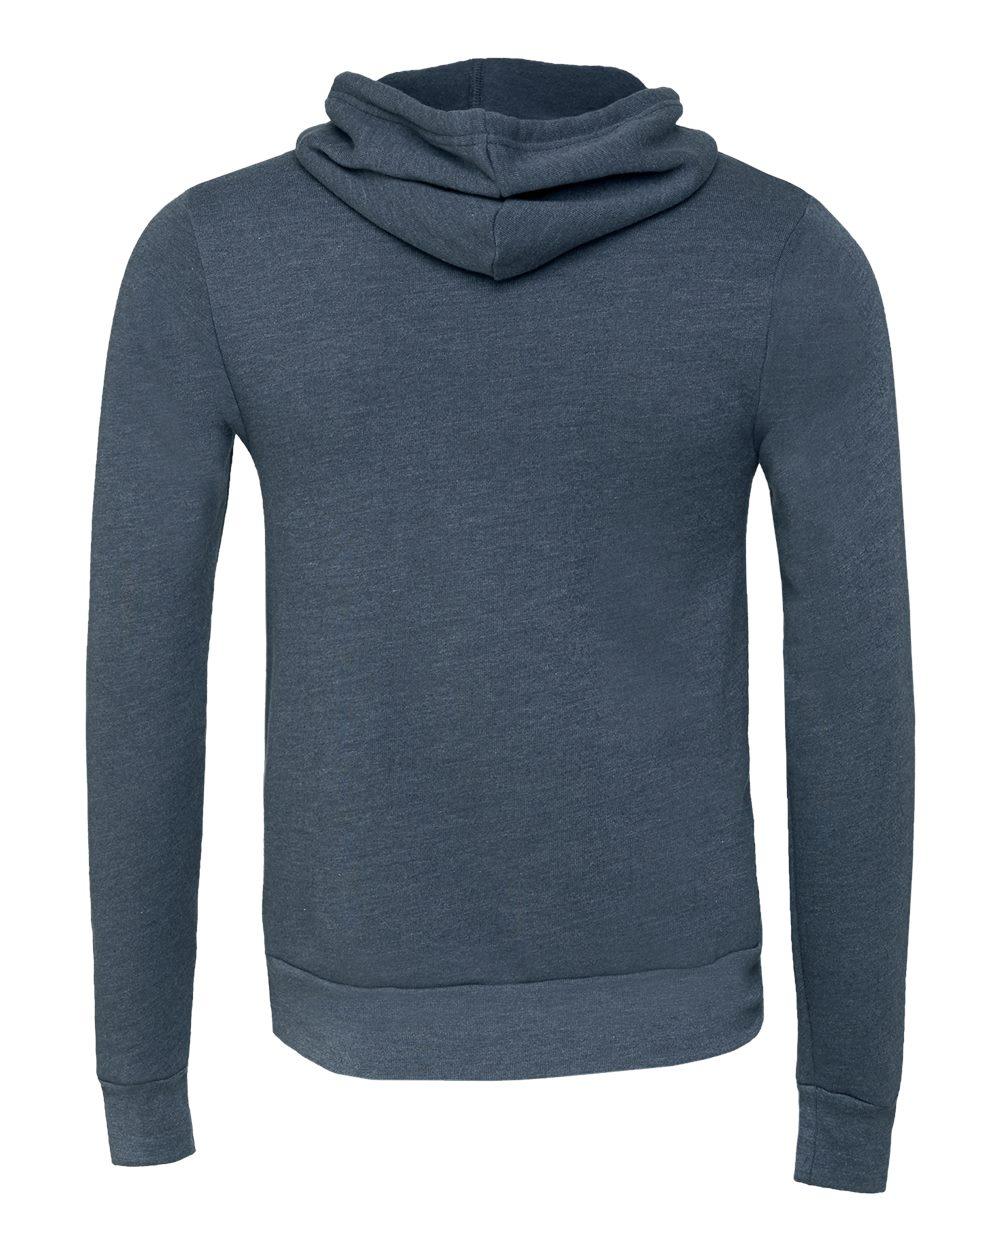 Bella-Canvas-Unisex-Sponge-Hooded-Pullover-Sweatshirt-Blank-3719-up-to-2XL thumbnail 53